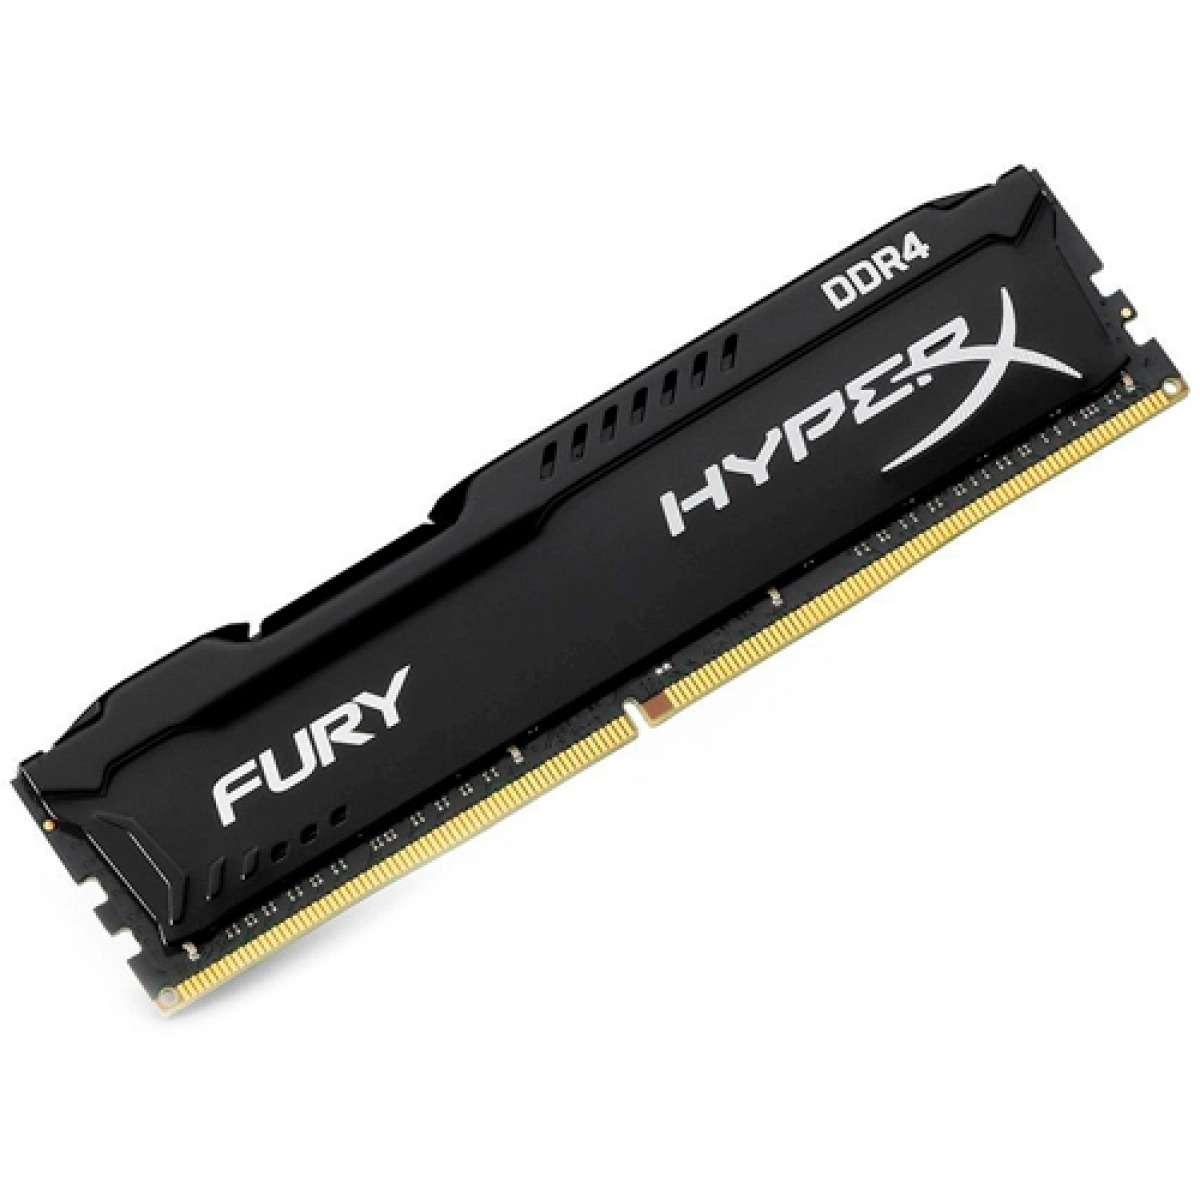 Memória Gamer Kingston HyperX Fury Black 8GB 2666MHz DDR4 CL16 - HX426C16FB3/8